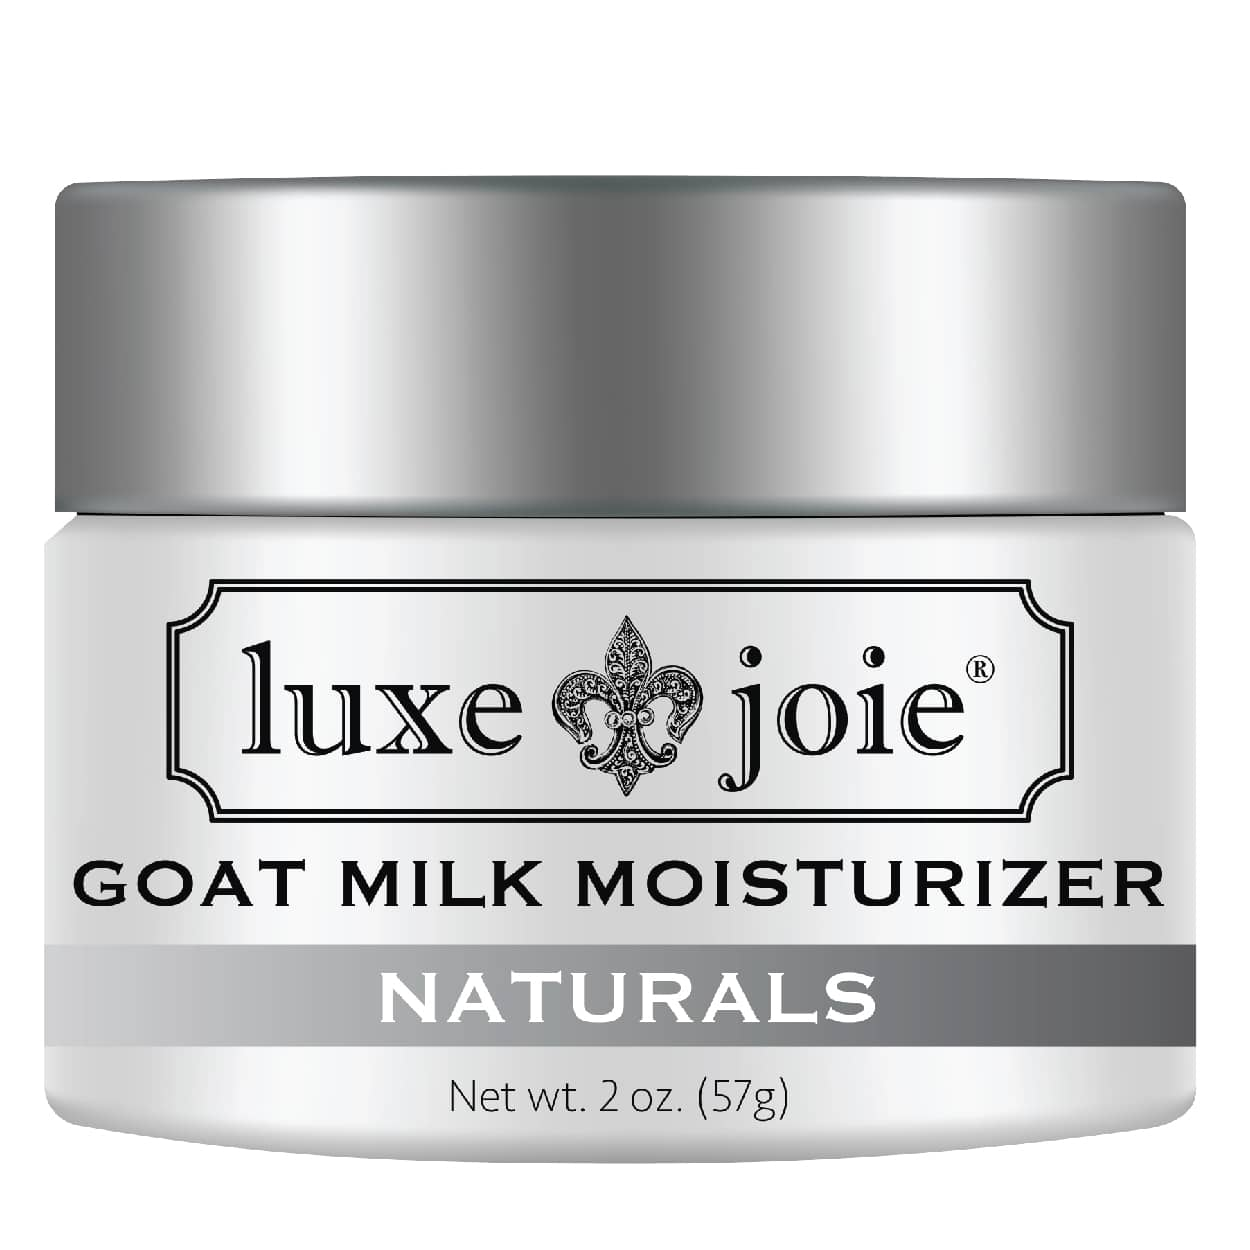 goat milk moisturizer on white background